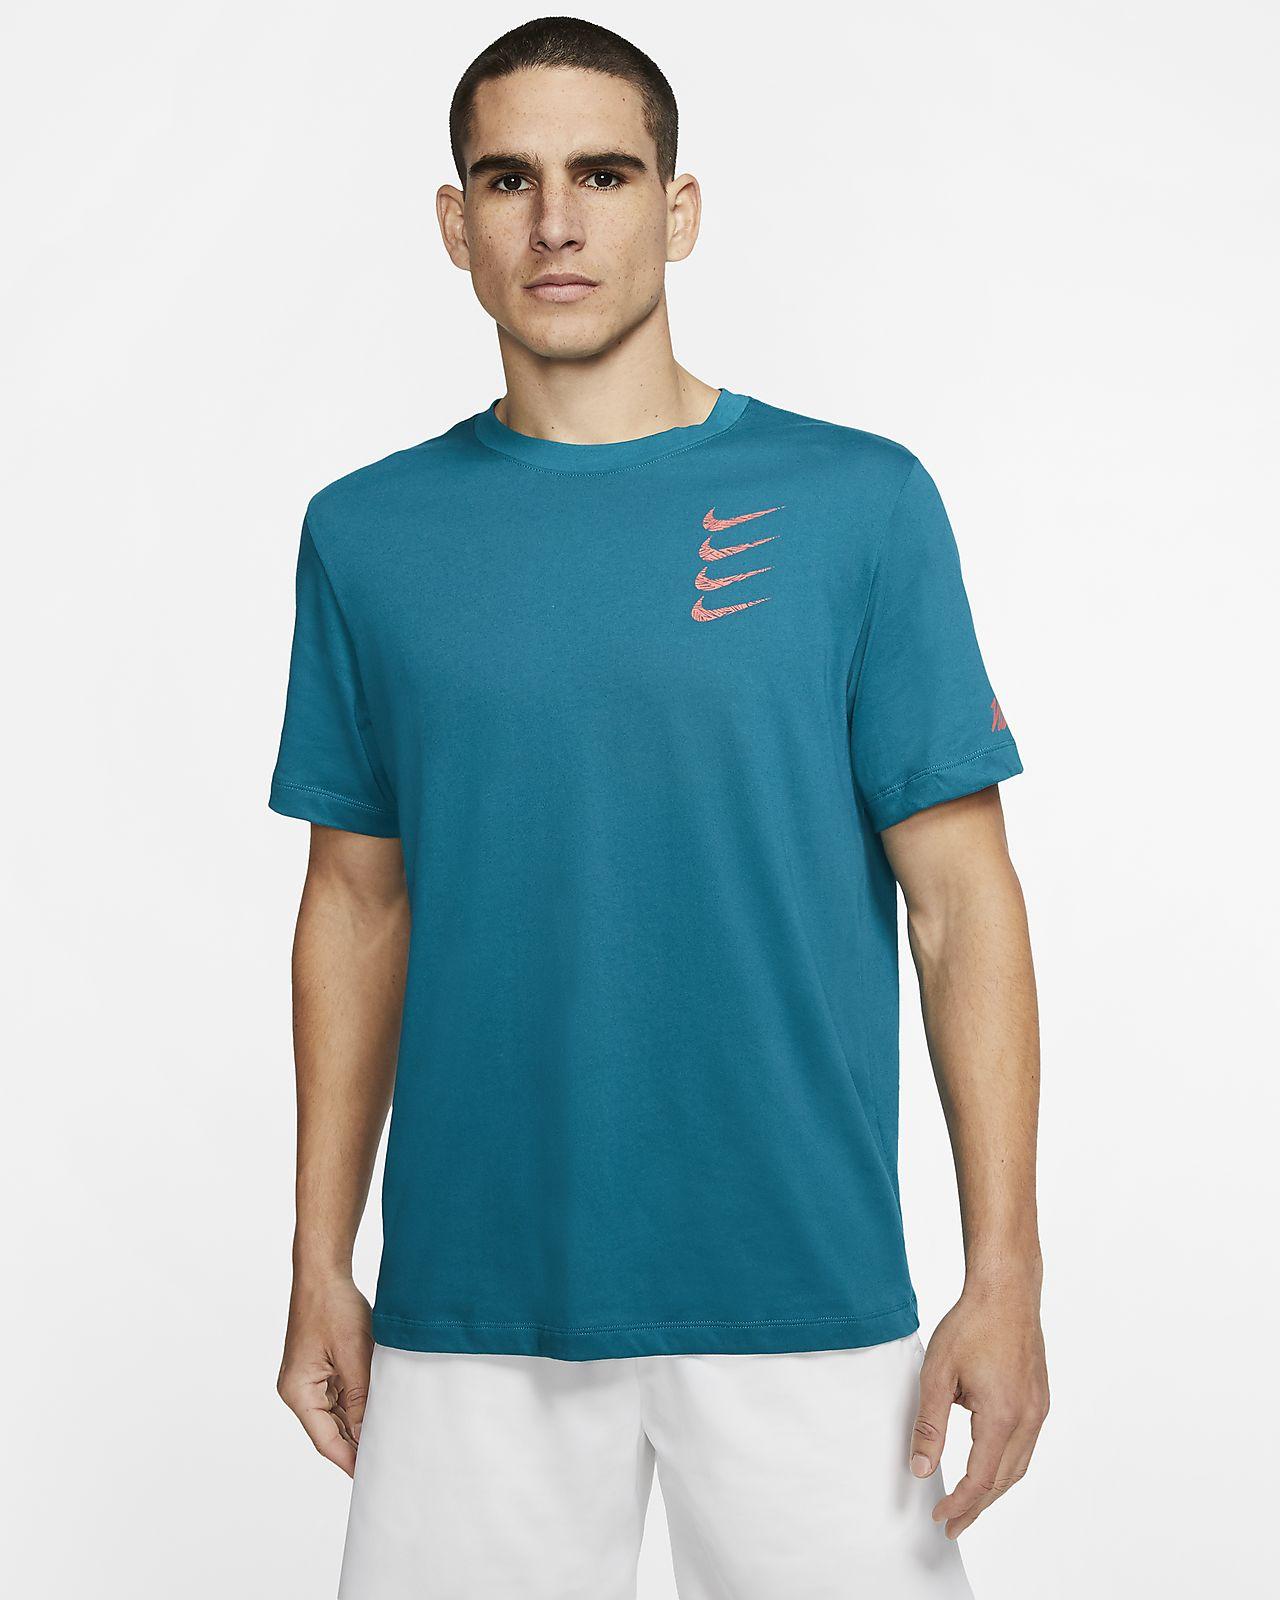 Nike Dri-FIT Samarreta estampada d'entrenament - Home